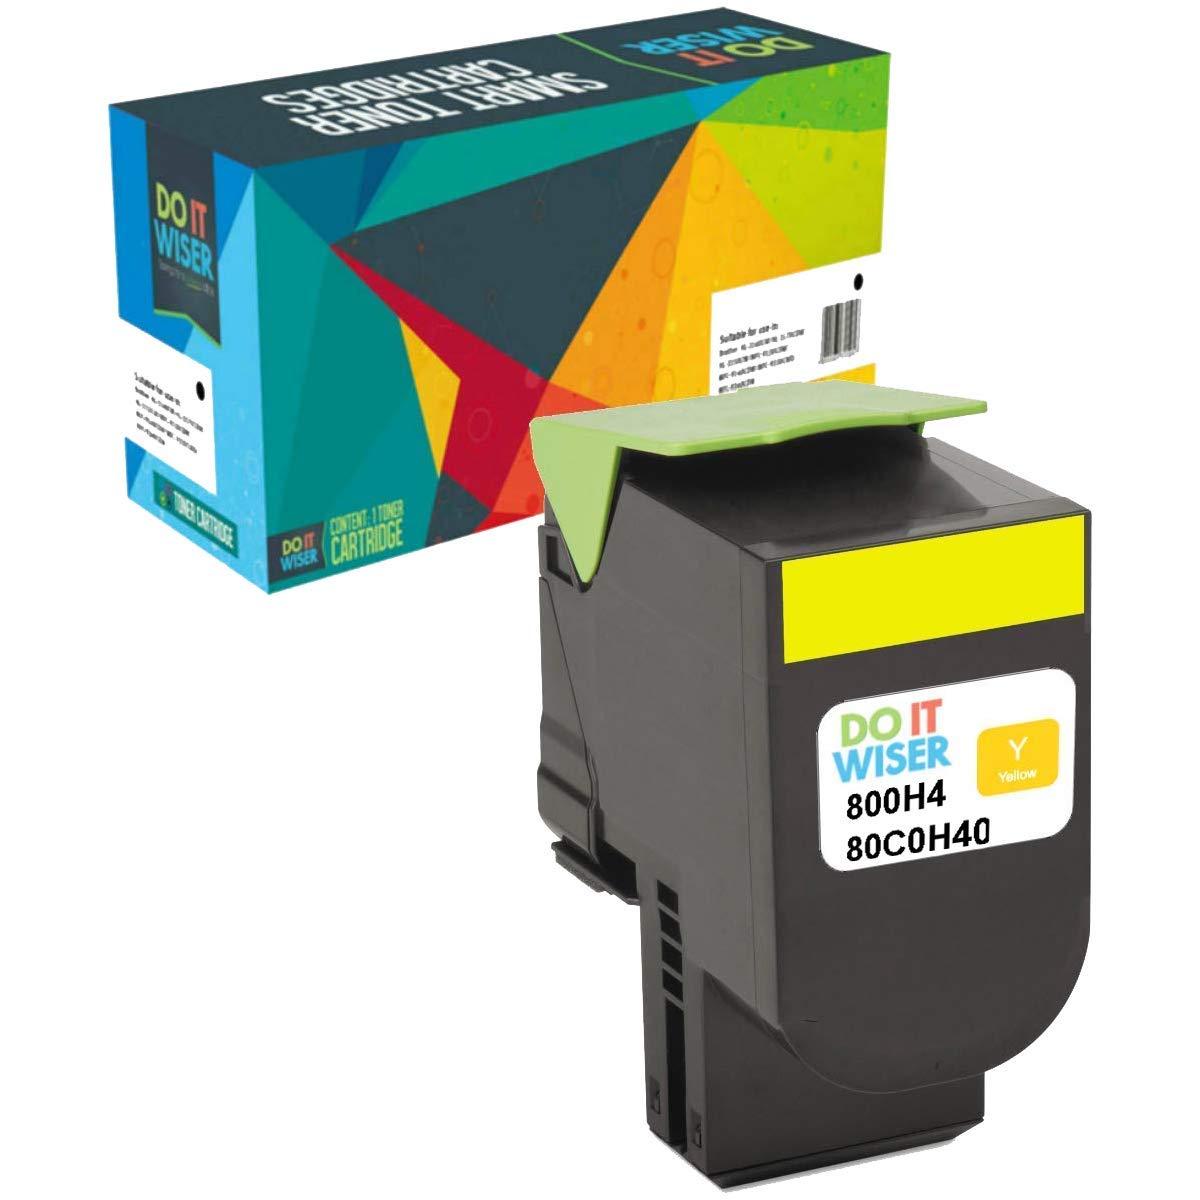 Toner Alternativo ( X1 ) Alta Capacidad Yellow 801HY CX410de CX410dte CX410e CX510dthe CX510dhe CX510de 80C1HY0000-Pagin